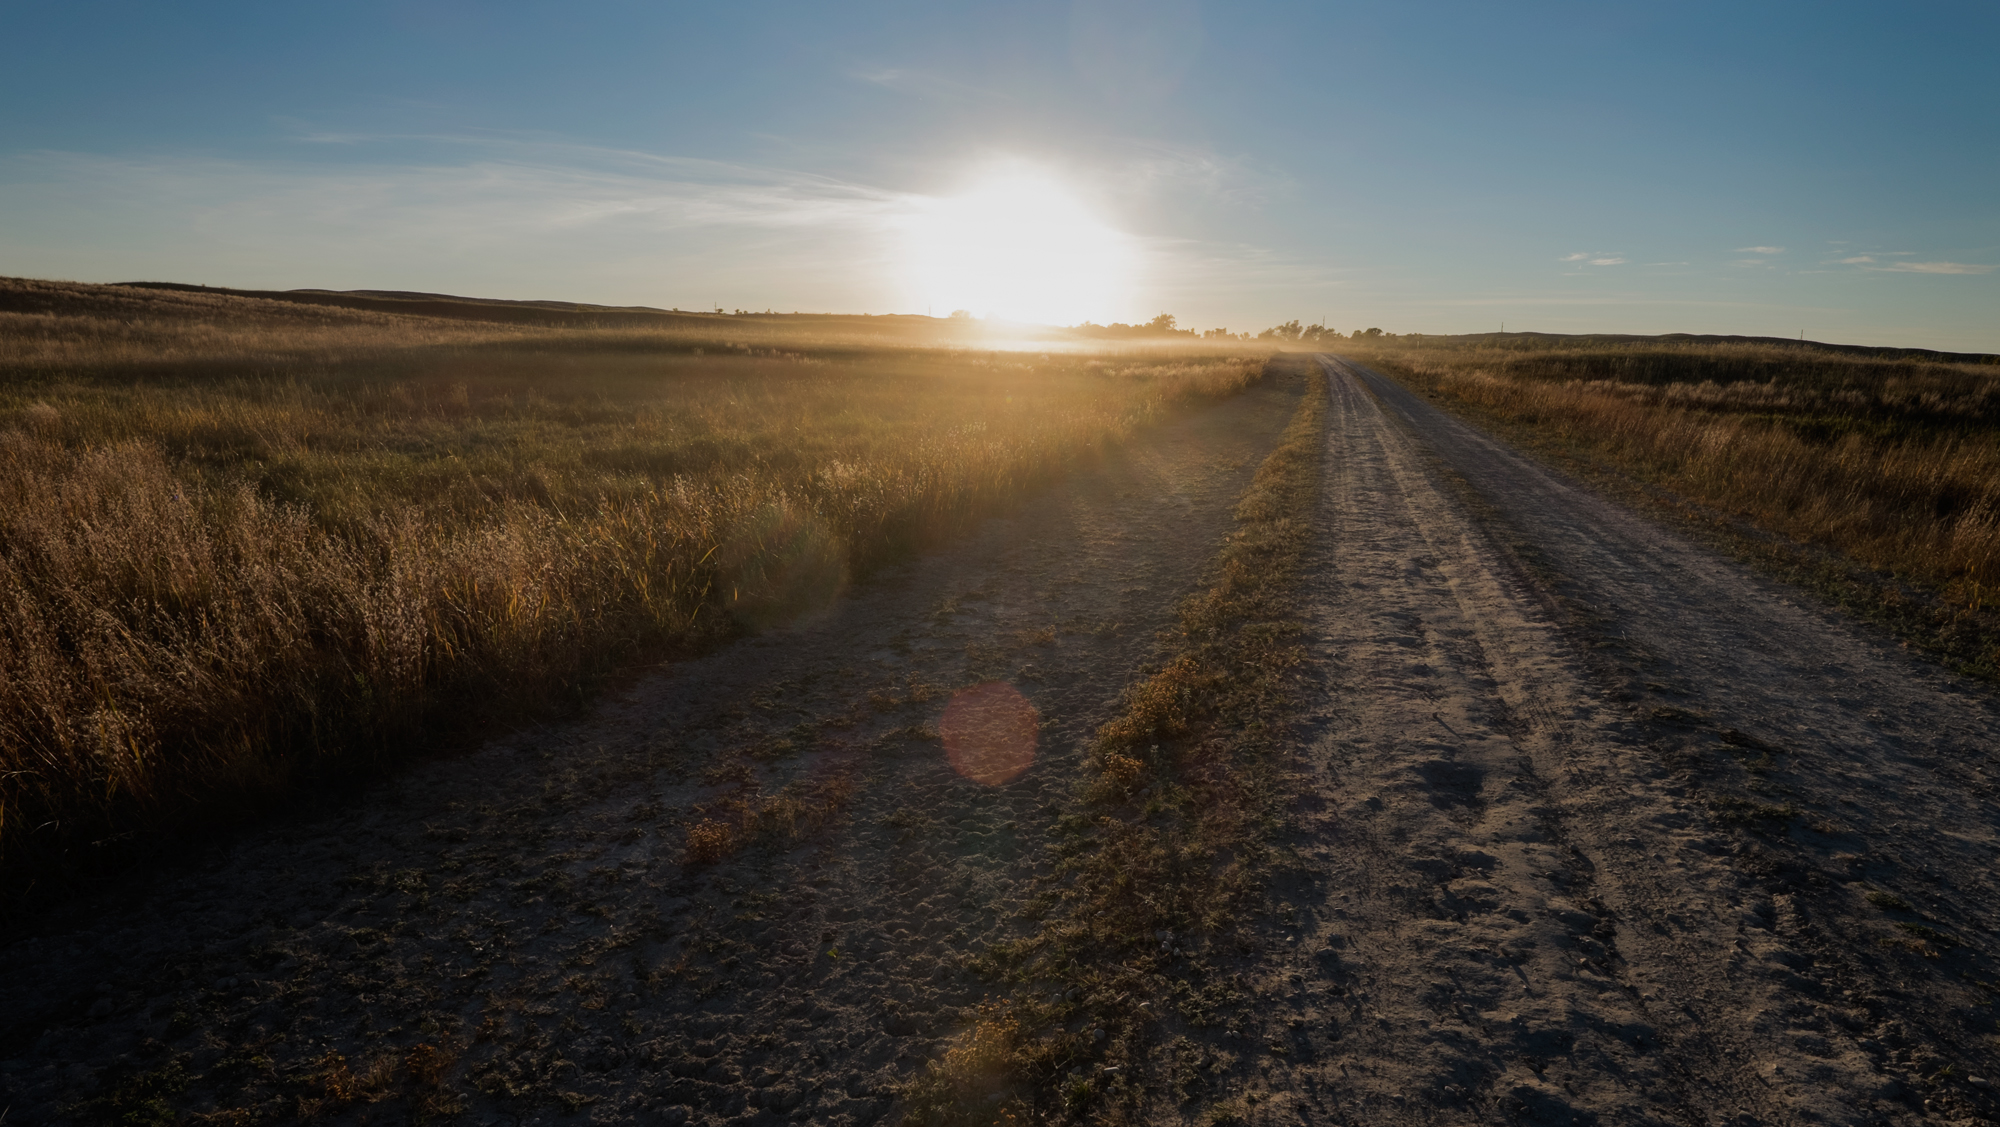 Bowring Ranch, Merriman, Nebraska